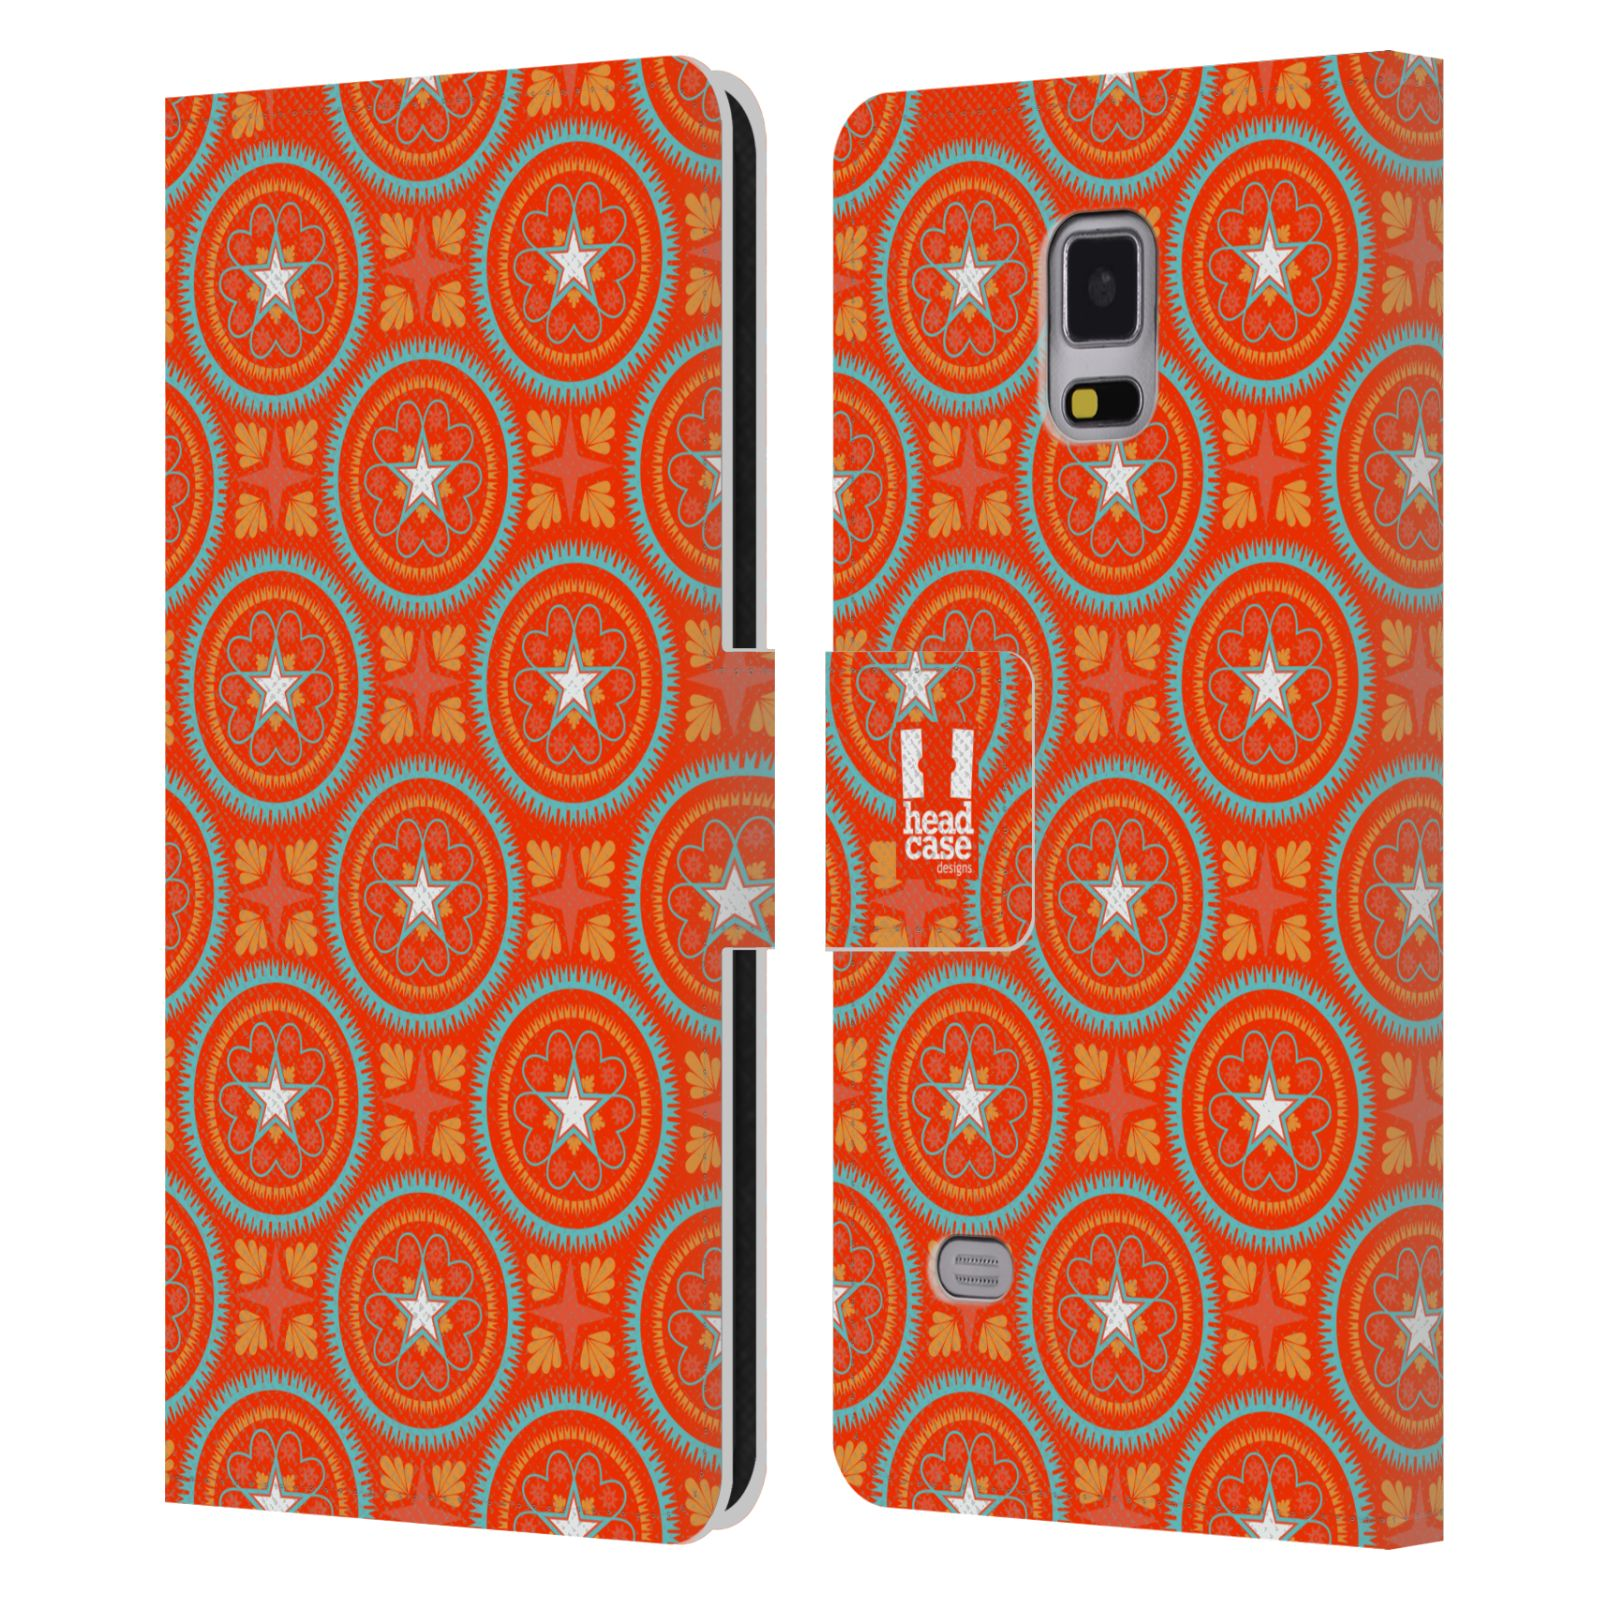 HEAD CASE Flipové pouzdro pro mobil Samsung Galaxy Note 4 Slovanský vzor oranžová hvězda